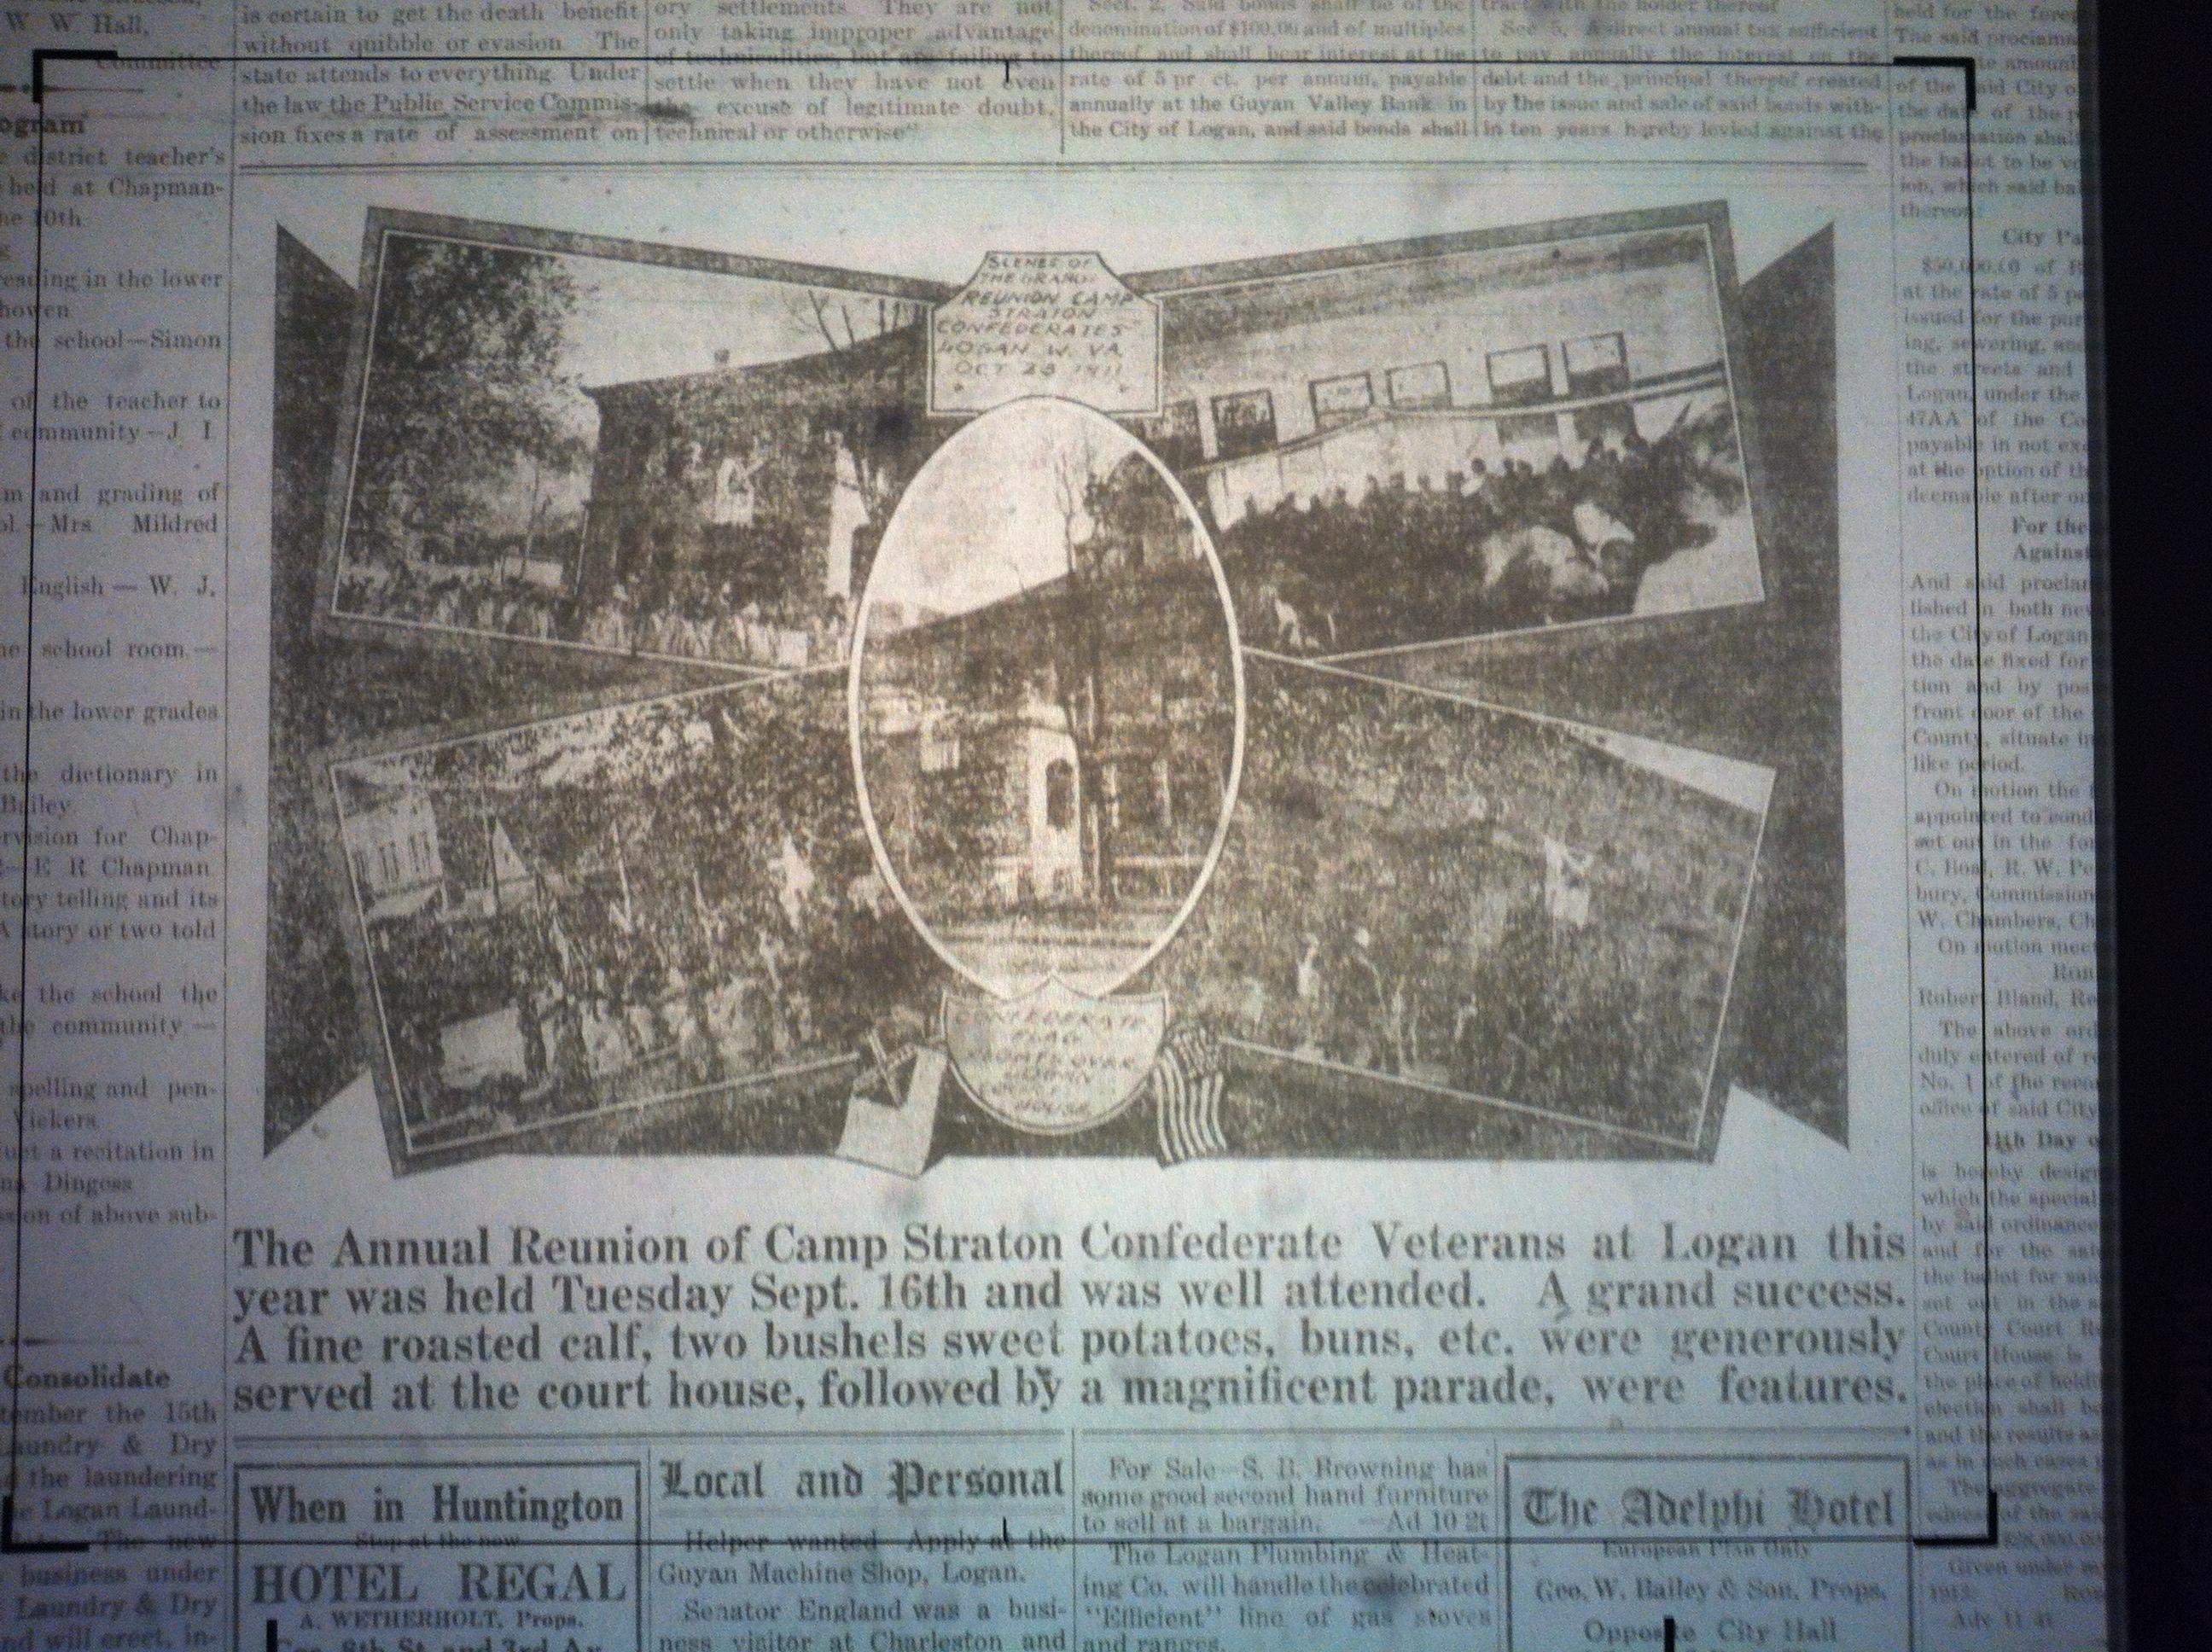 Camp Straton Reunion LB 09.19.1913 1.JPG